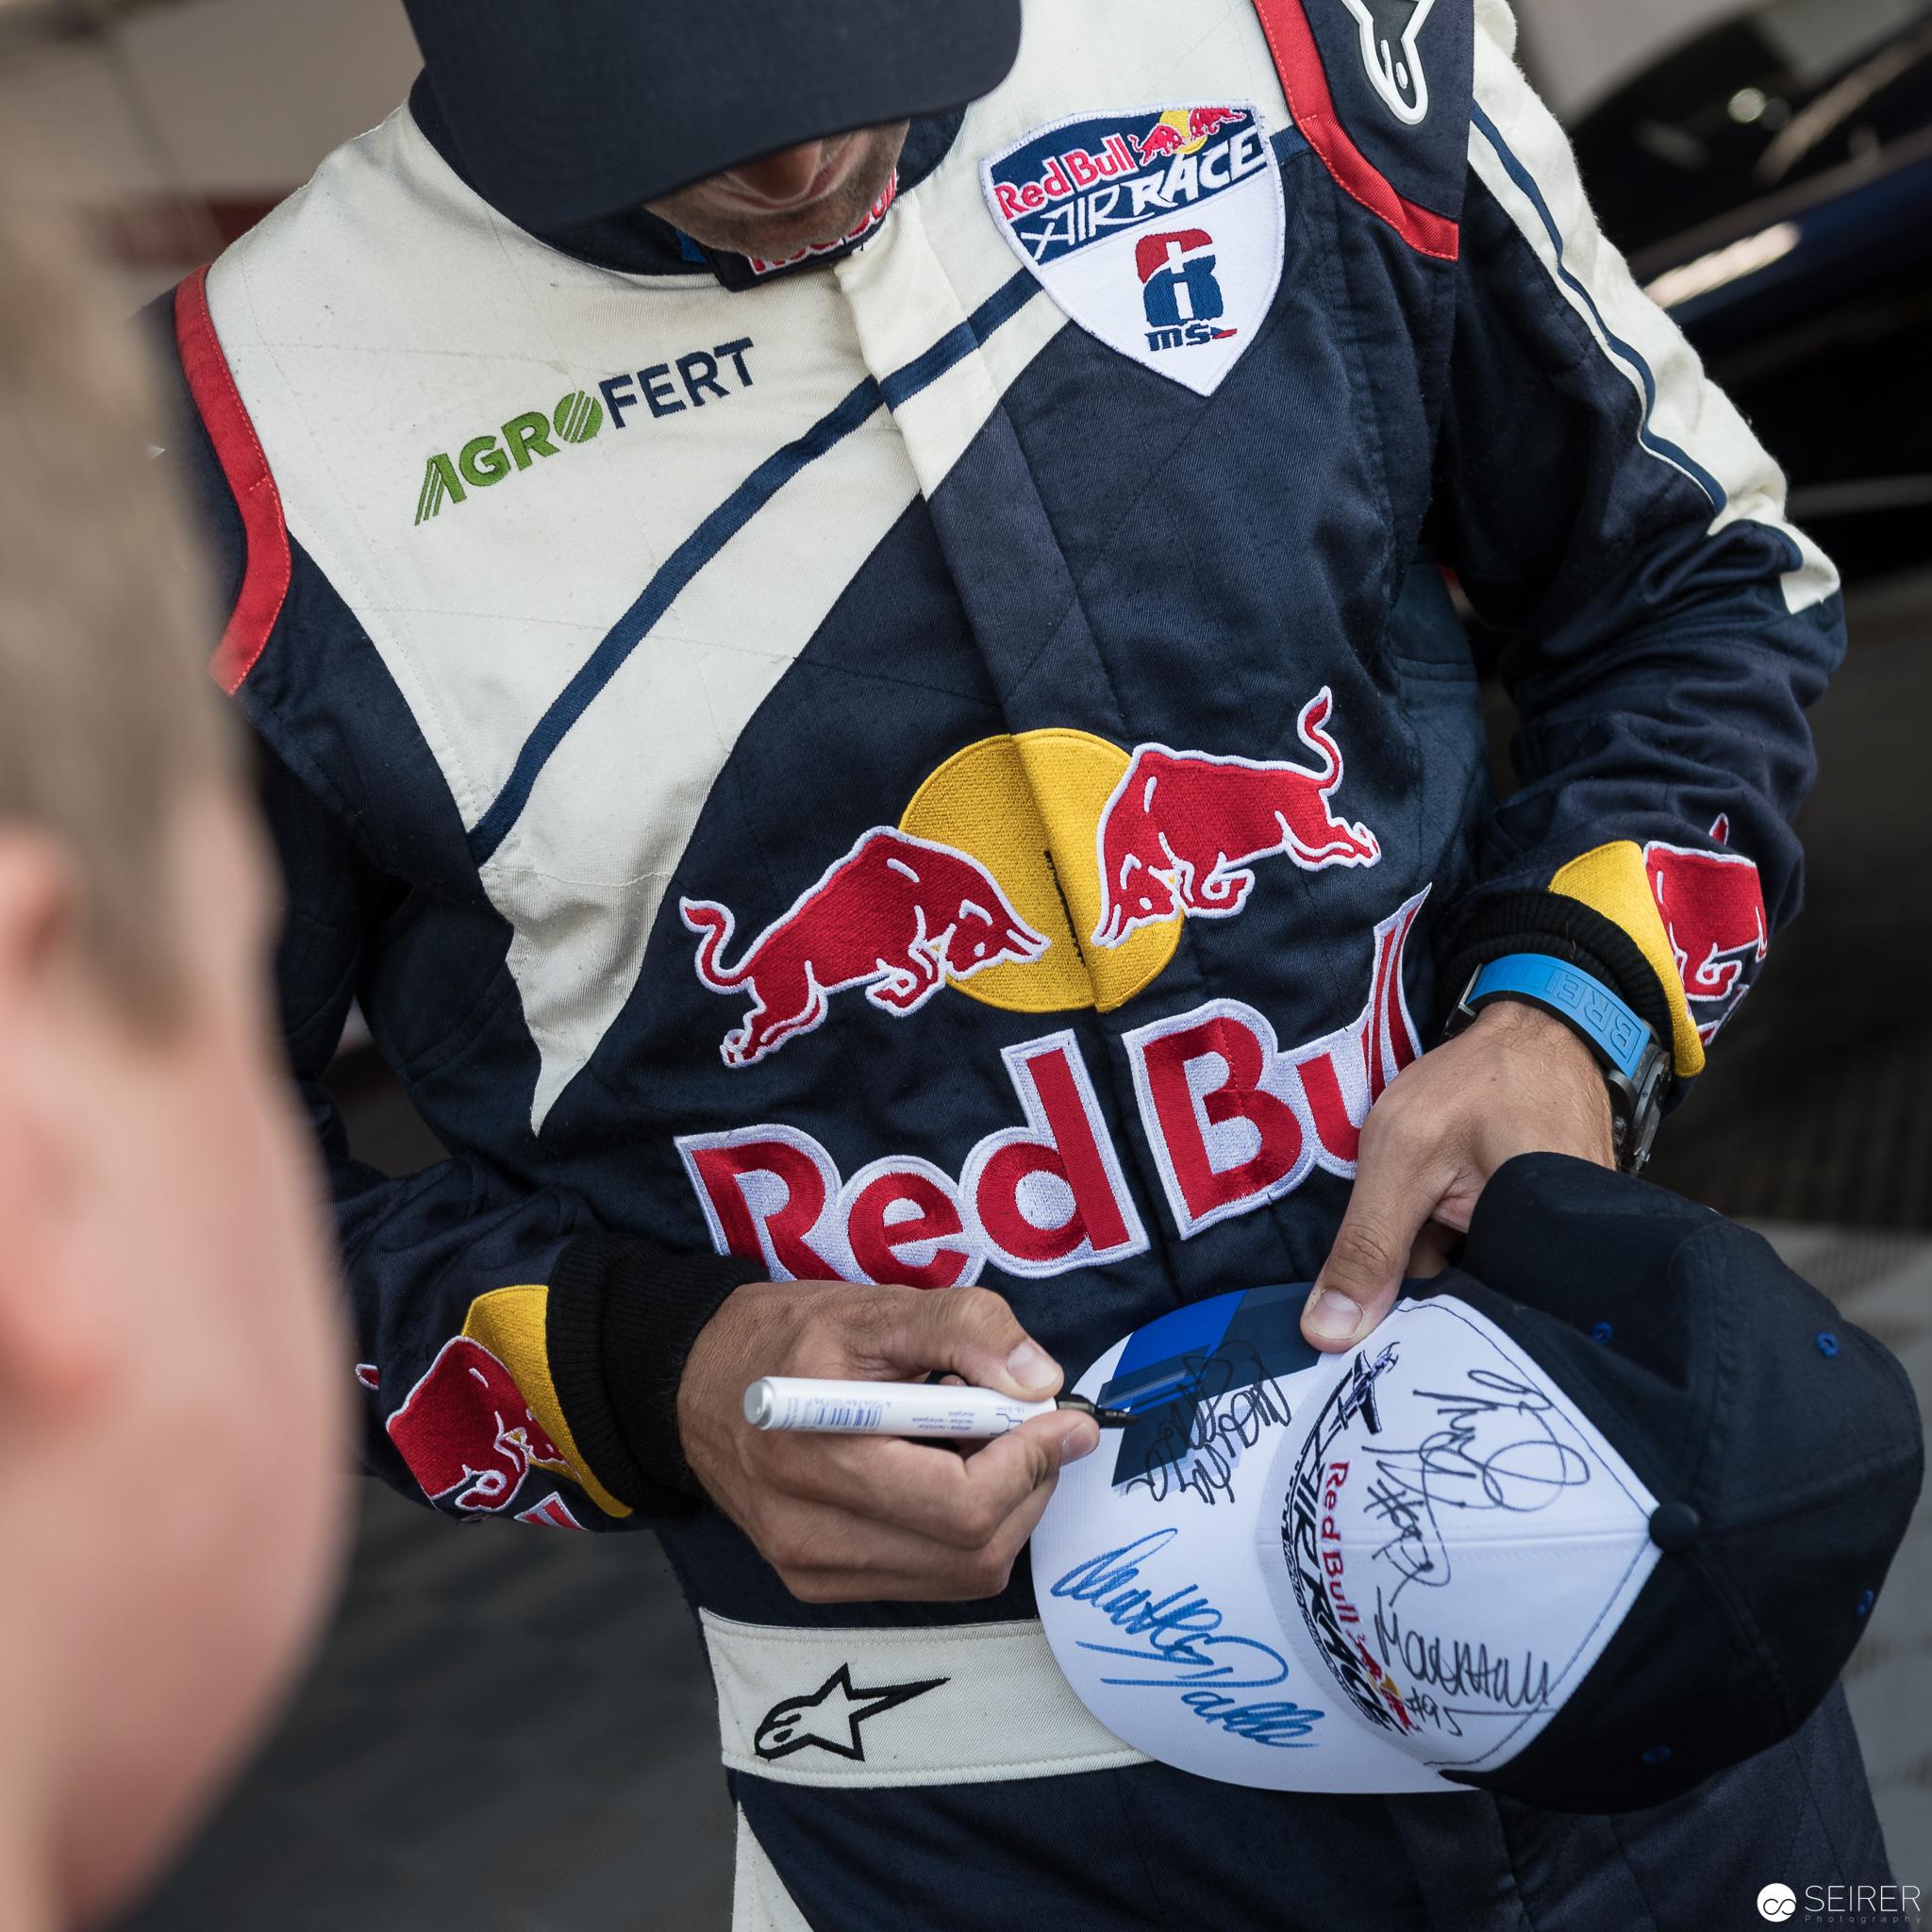 Martin Sonka gibt Autogramme, Red Bull Air Race 2018